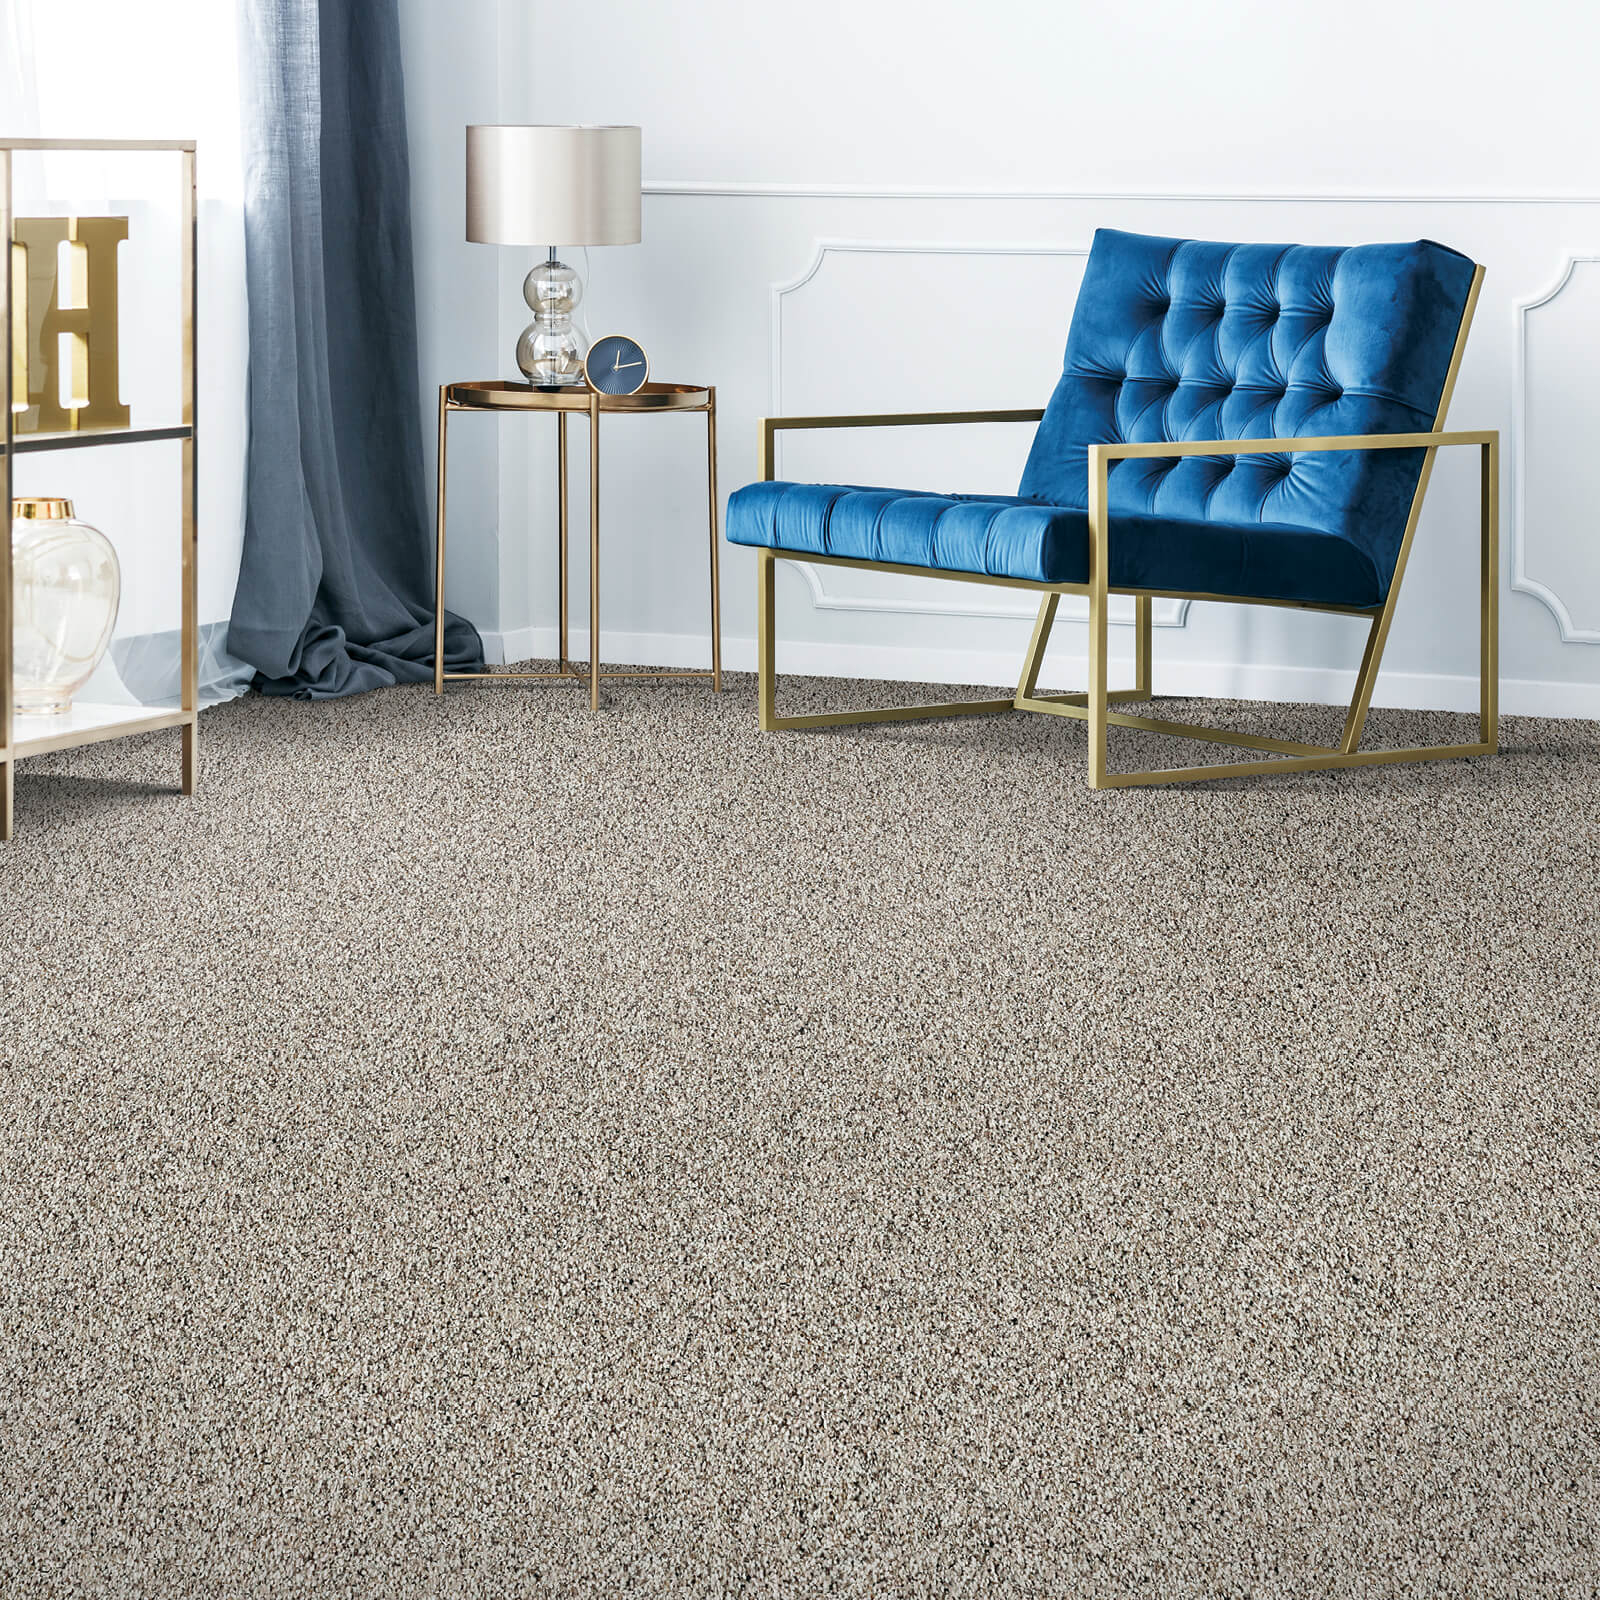 Remarkable vision of carpet | McSwain Carpet & Floors